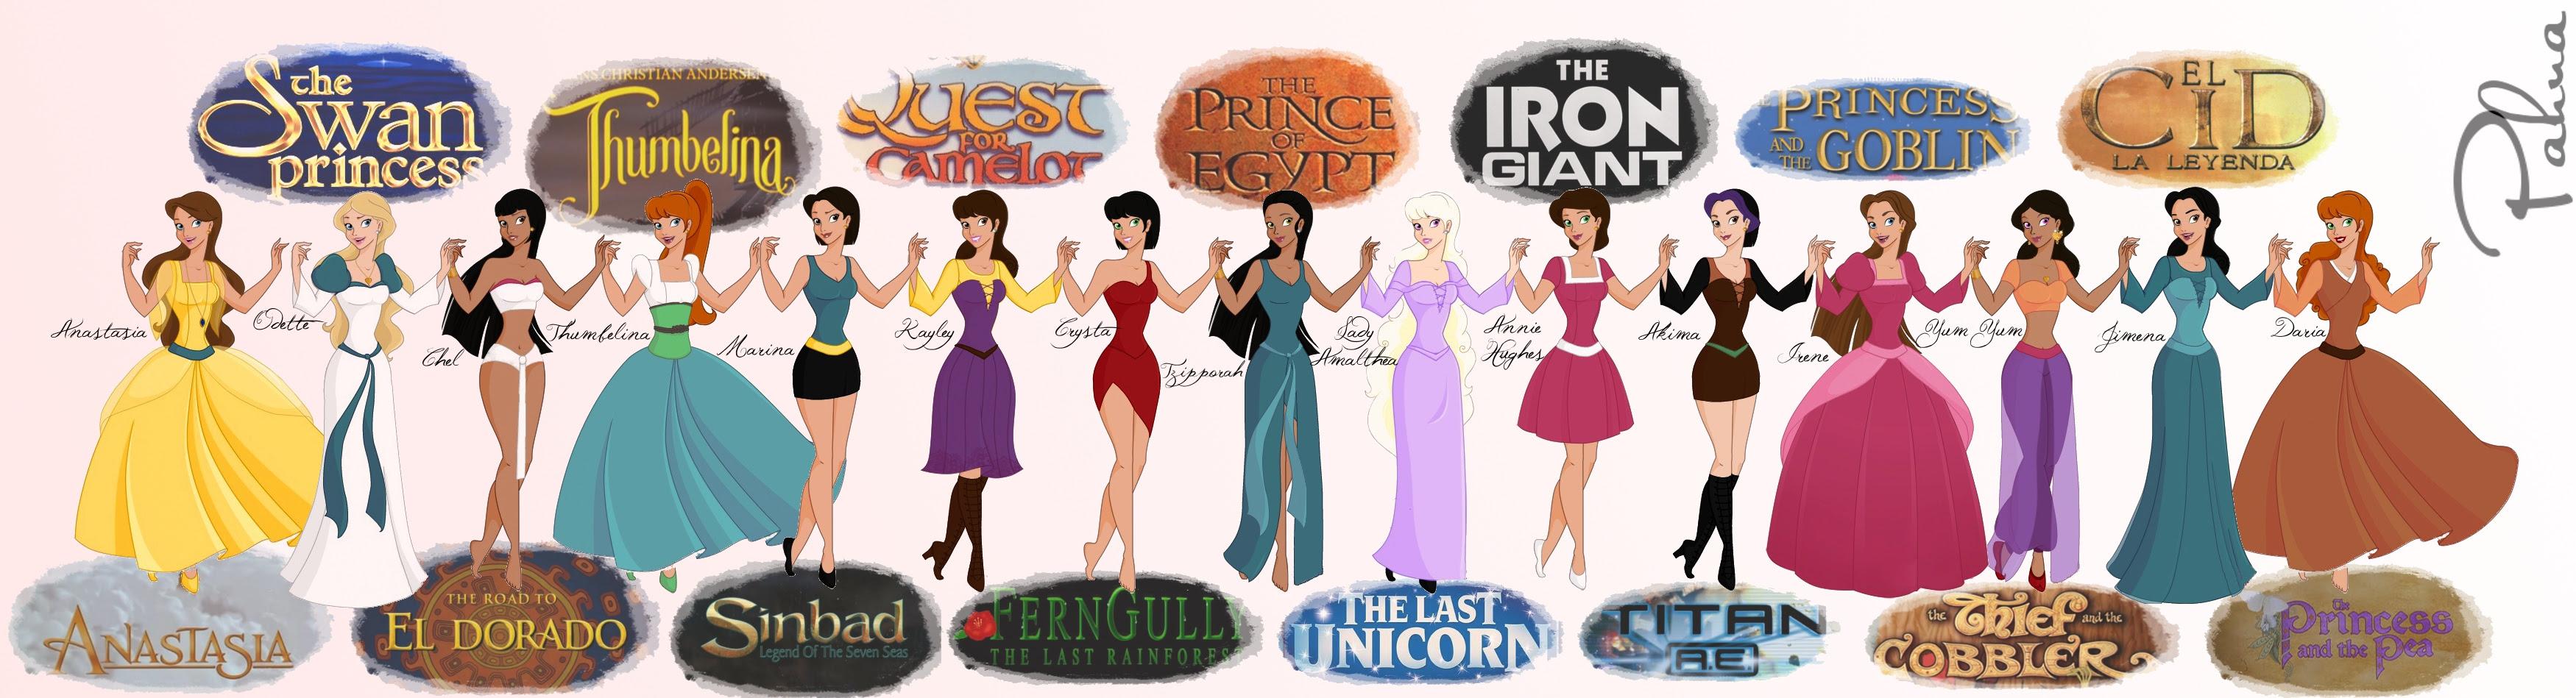 Non Disney Heroines by Pahua on DeviantArt